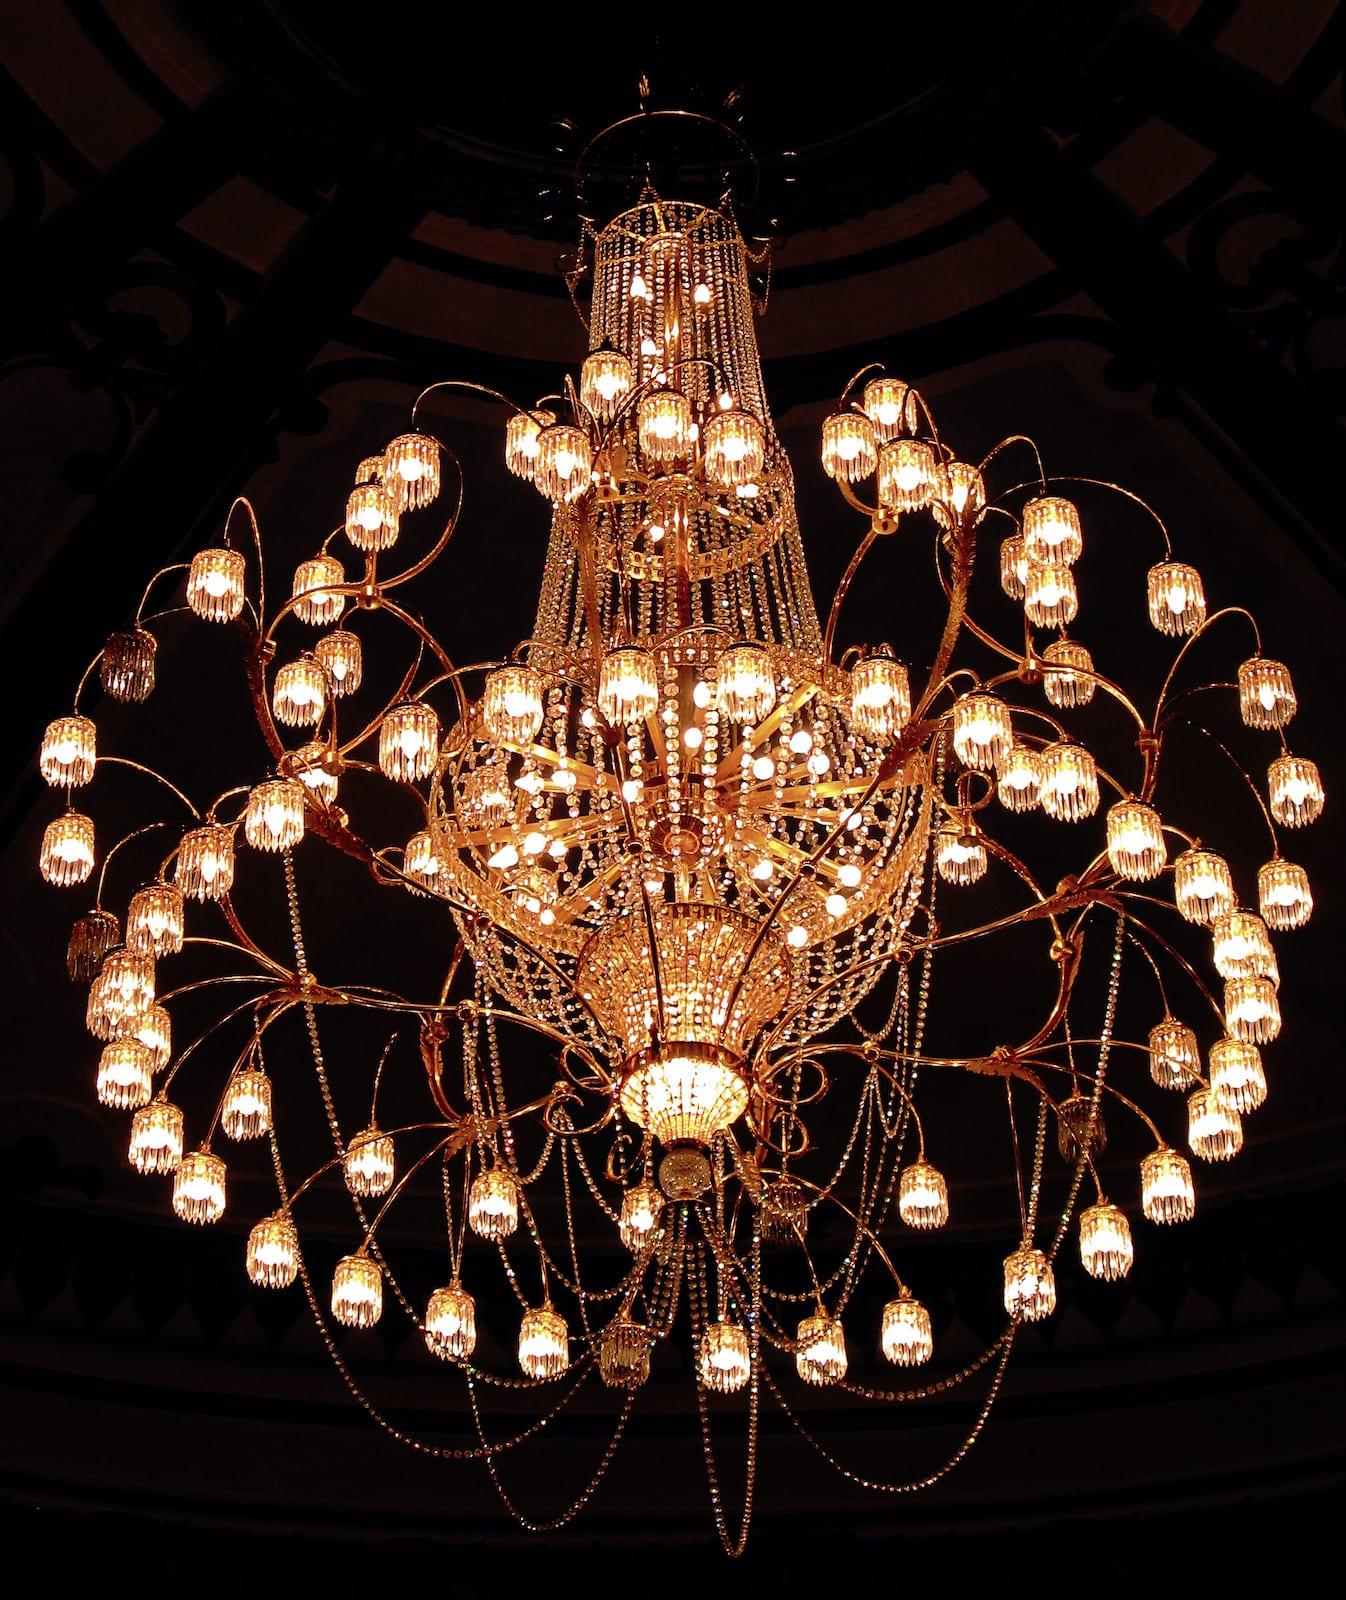 Hanoi Opera House Chandelier